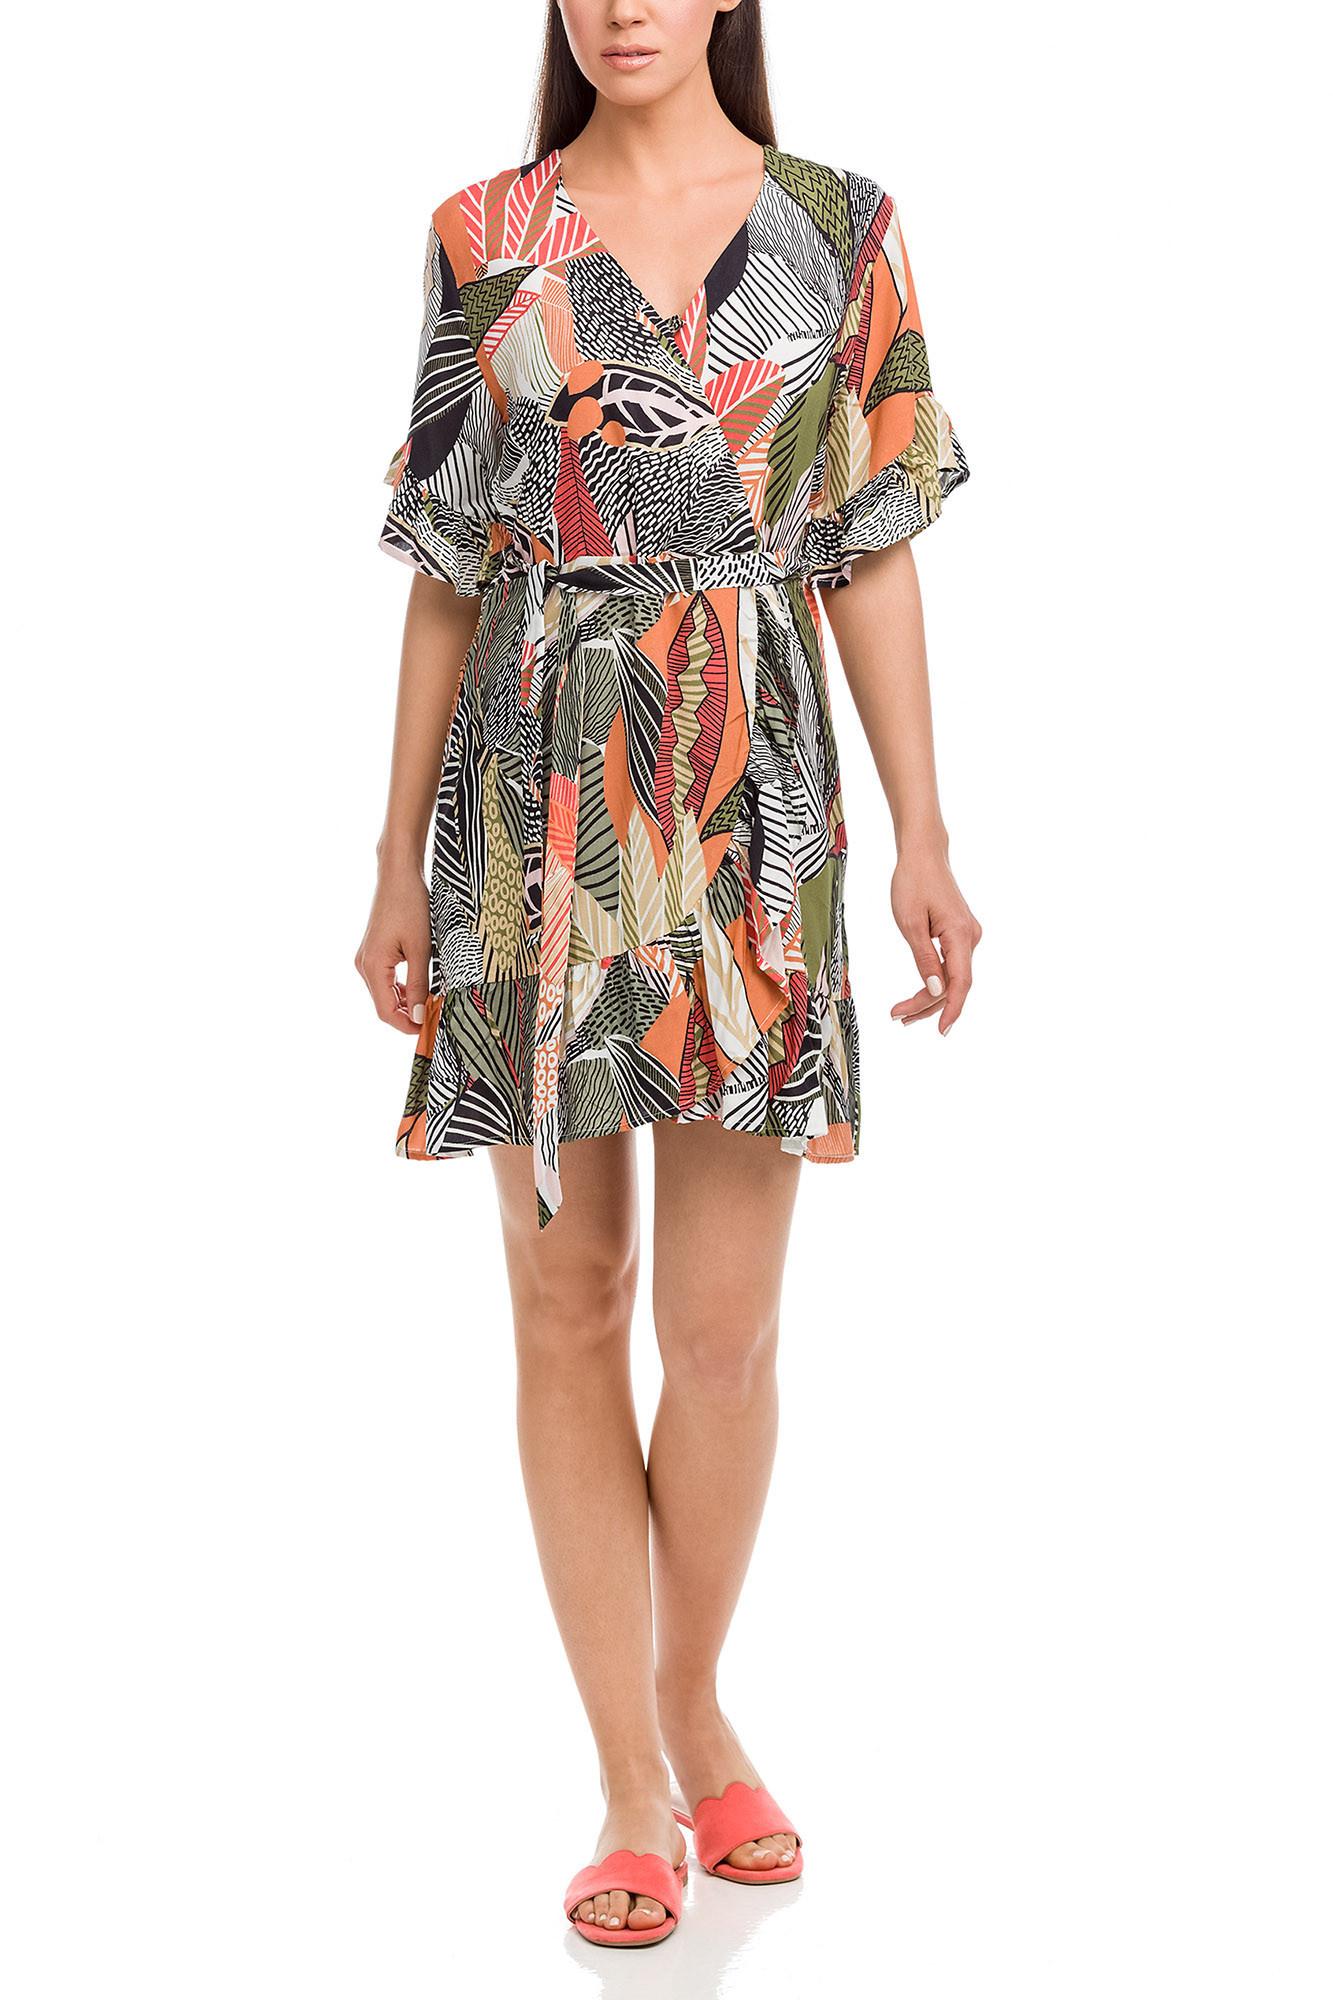 Vamp - Dámske šaty 12531 - Vamp coral spark m